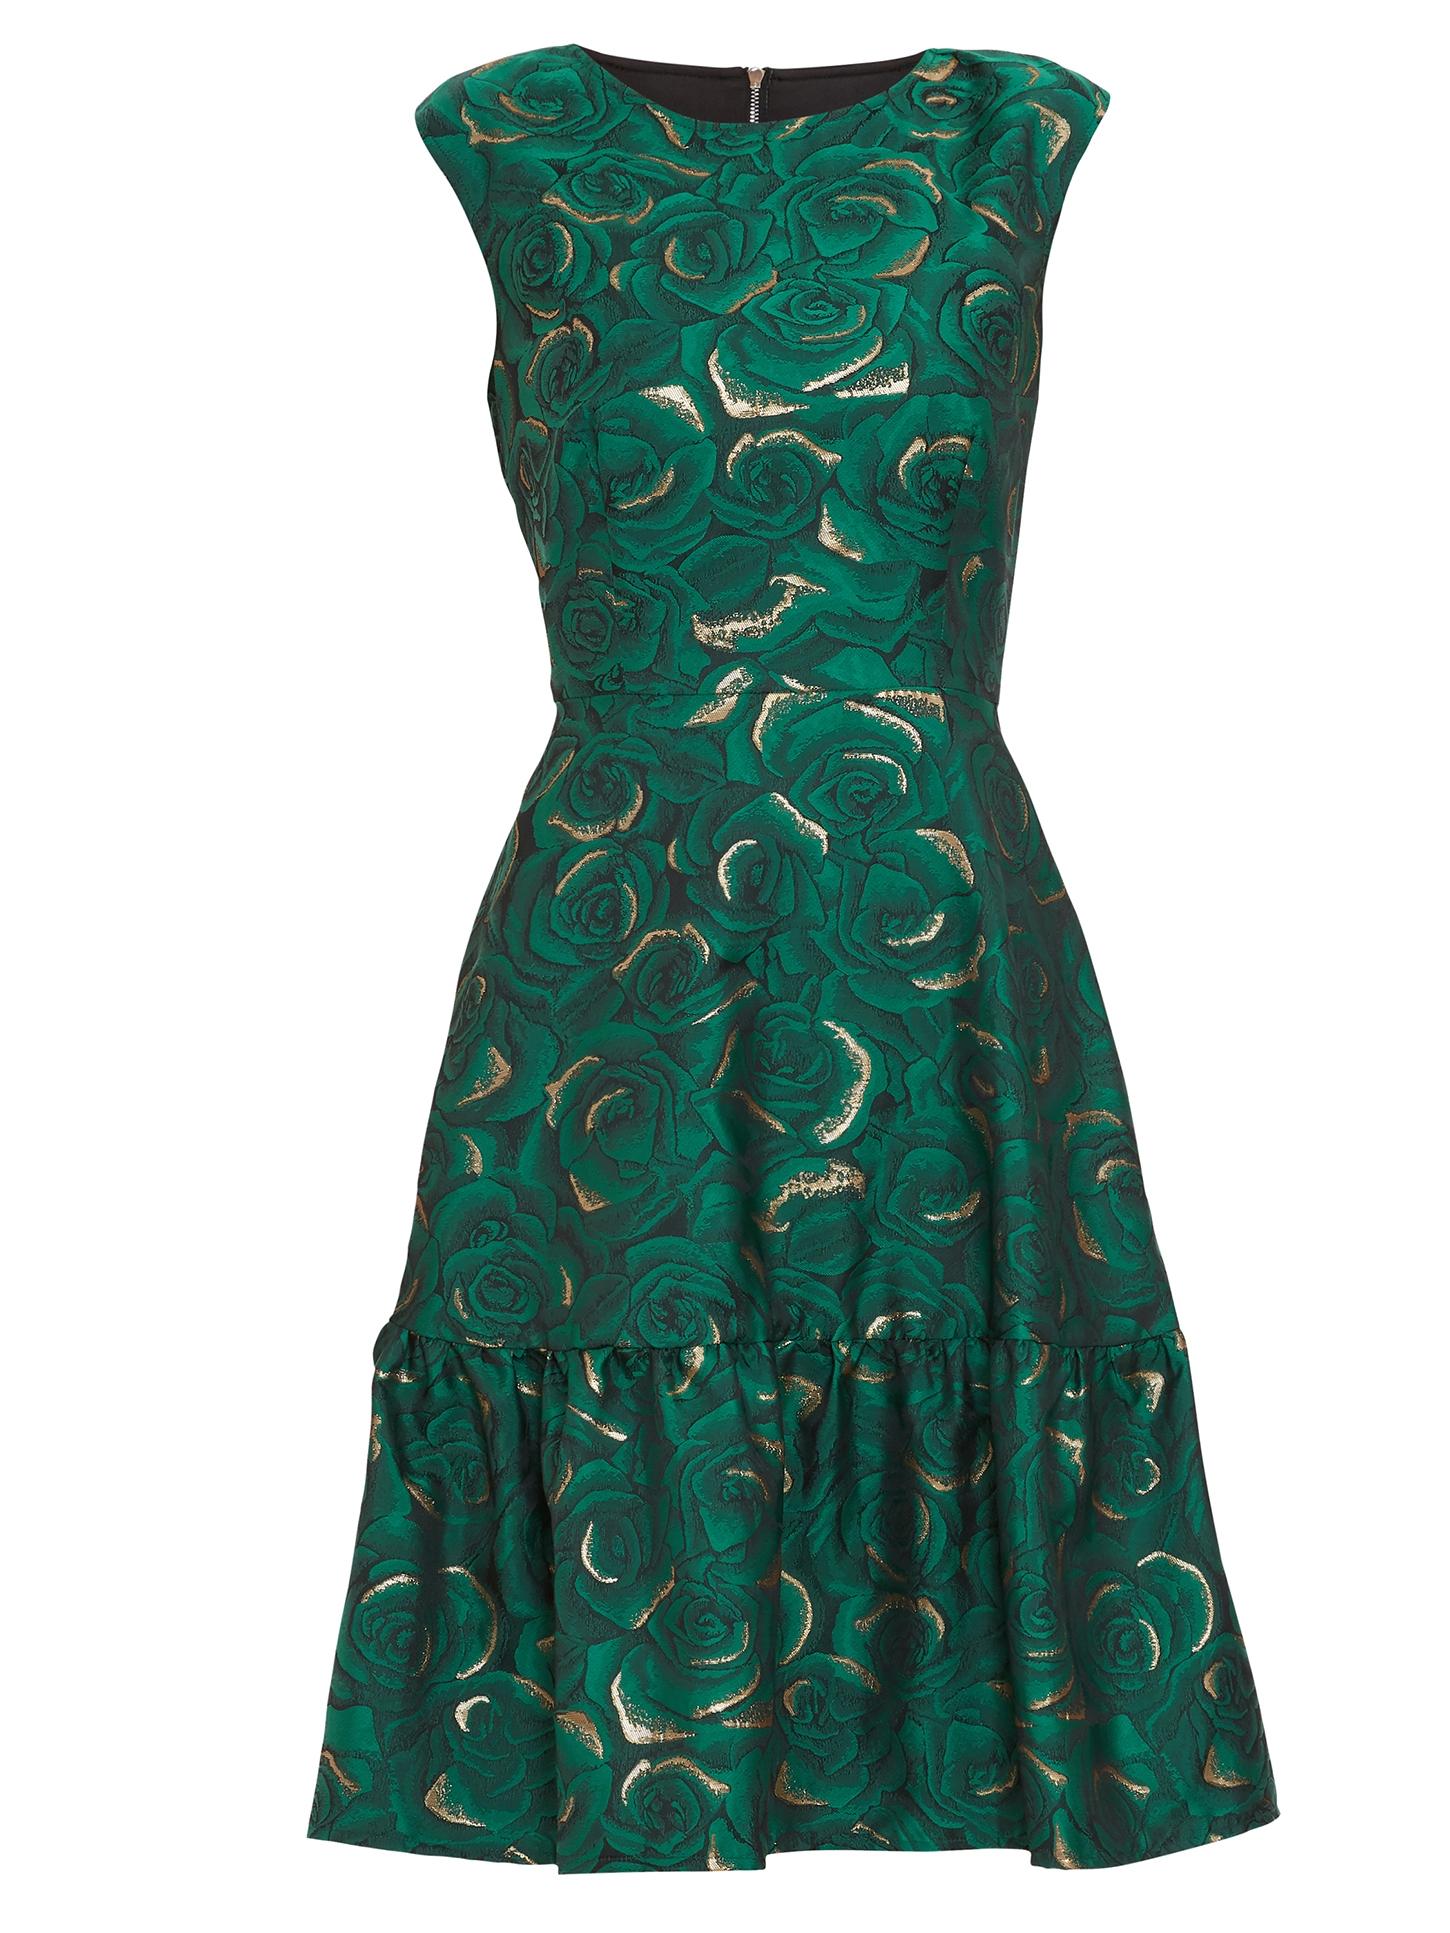 Nasra Jacquard Dress